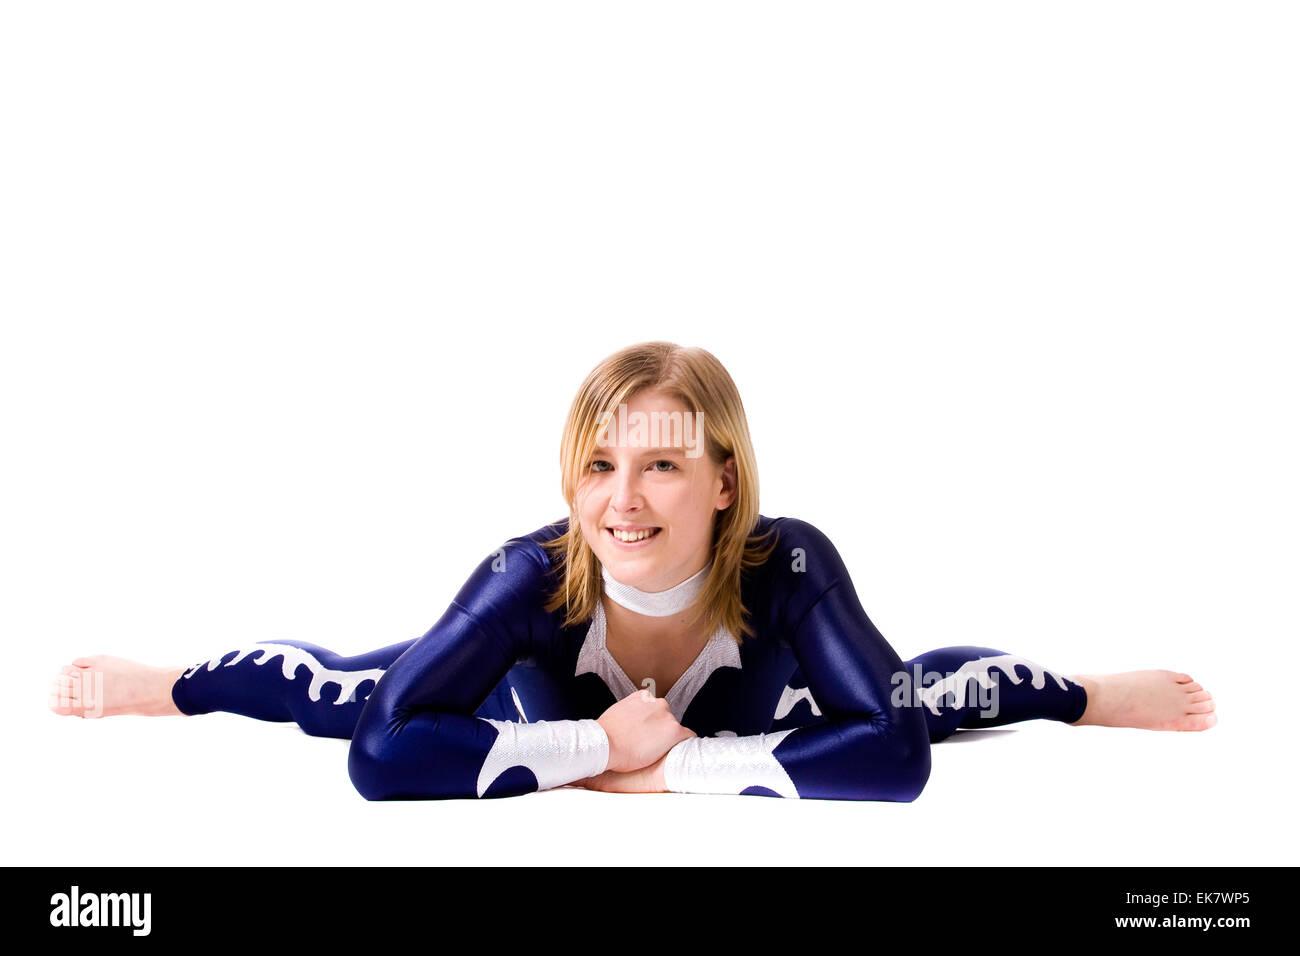 Resting acrobat girl - Stock Image